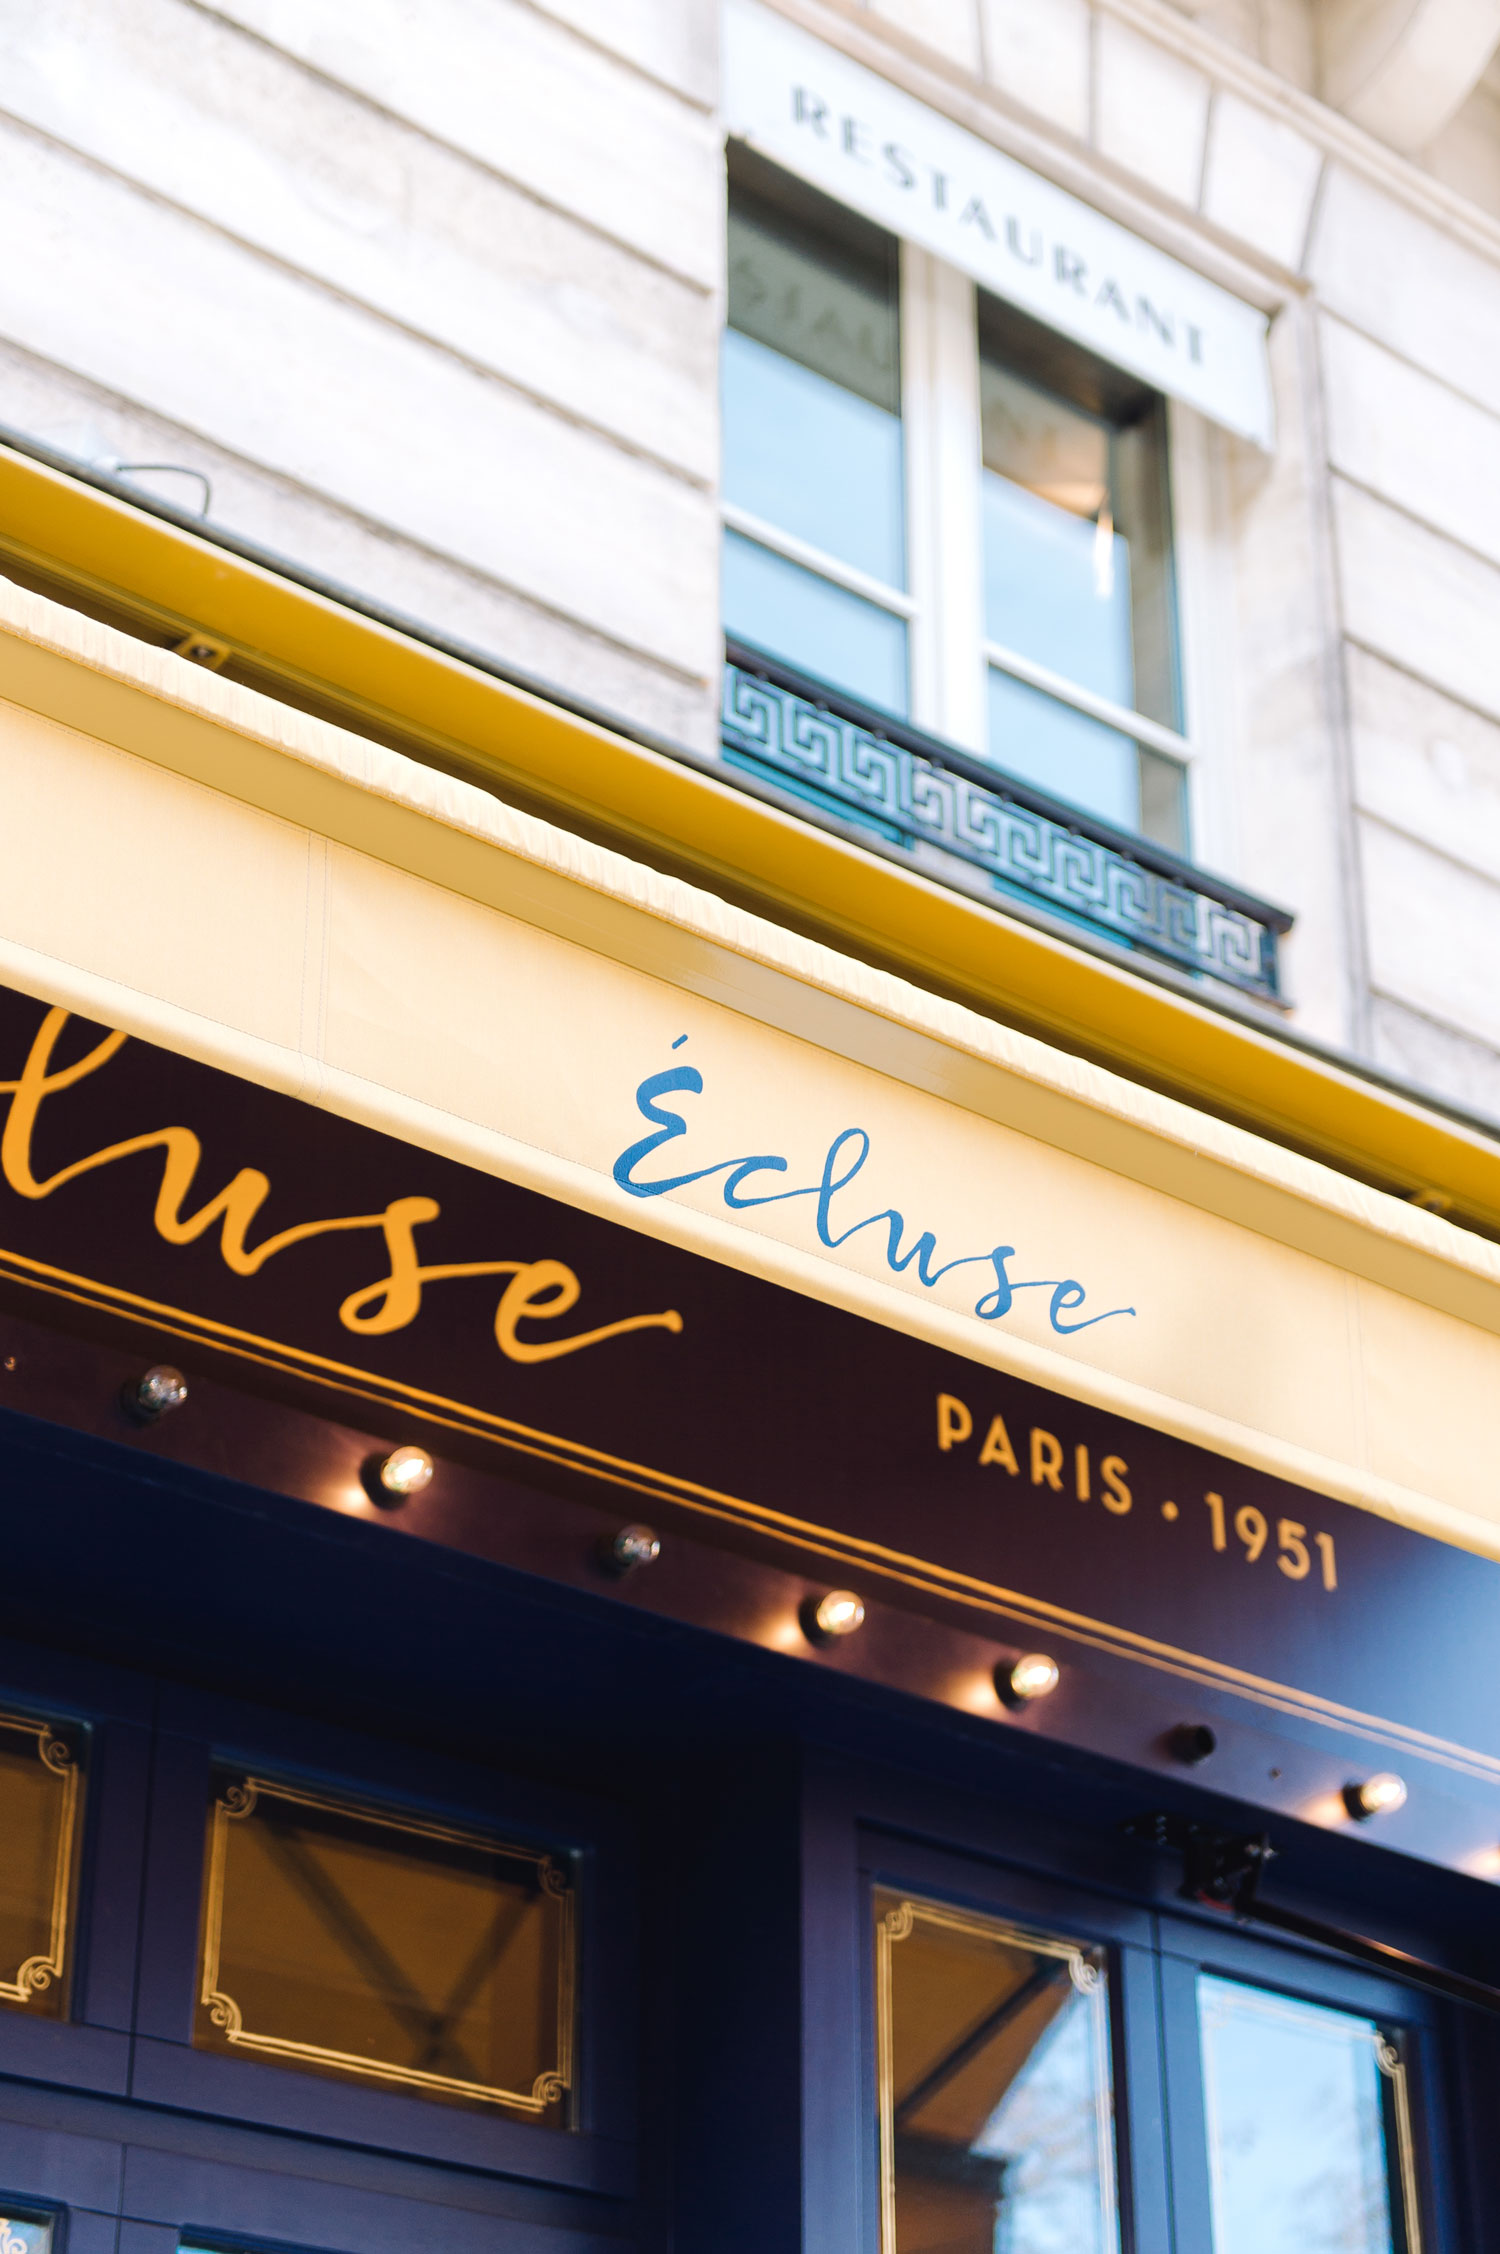 Elisabeth-Jones-Hennessy-Lecluse-Paris-05.jpg